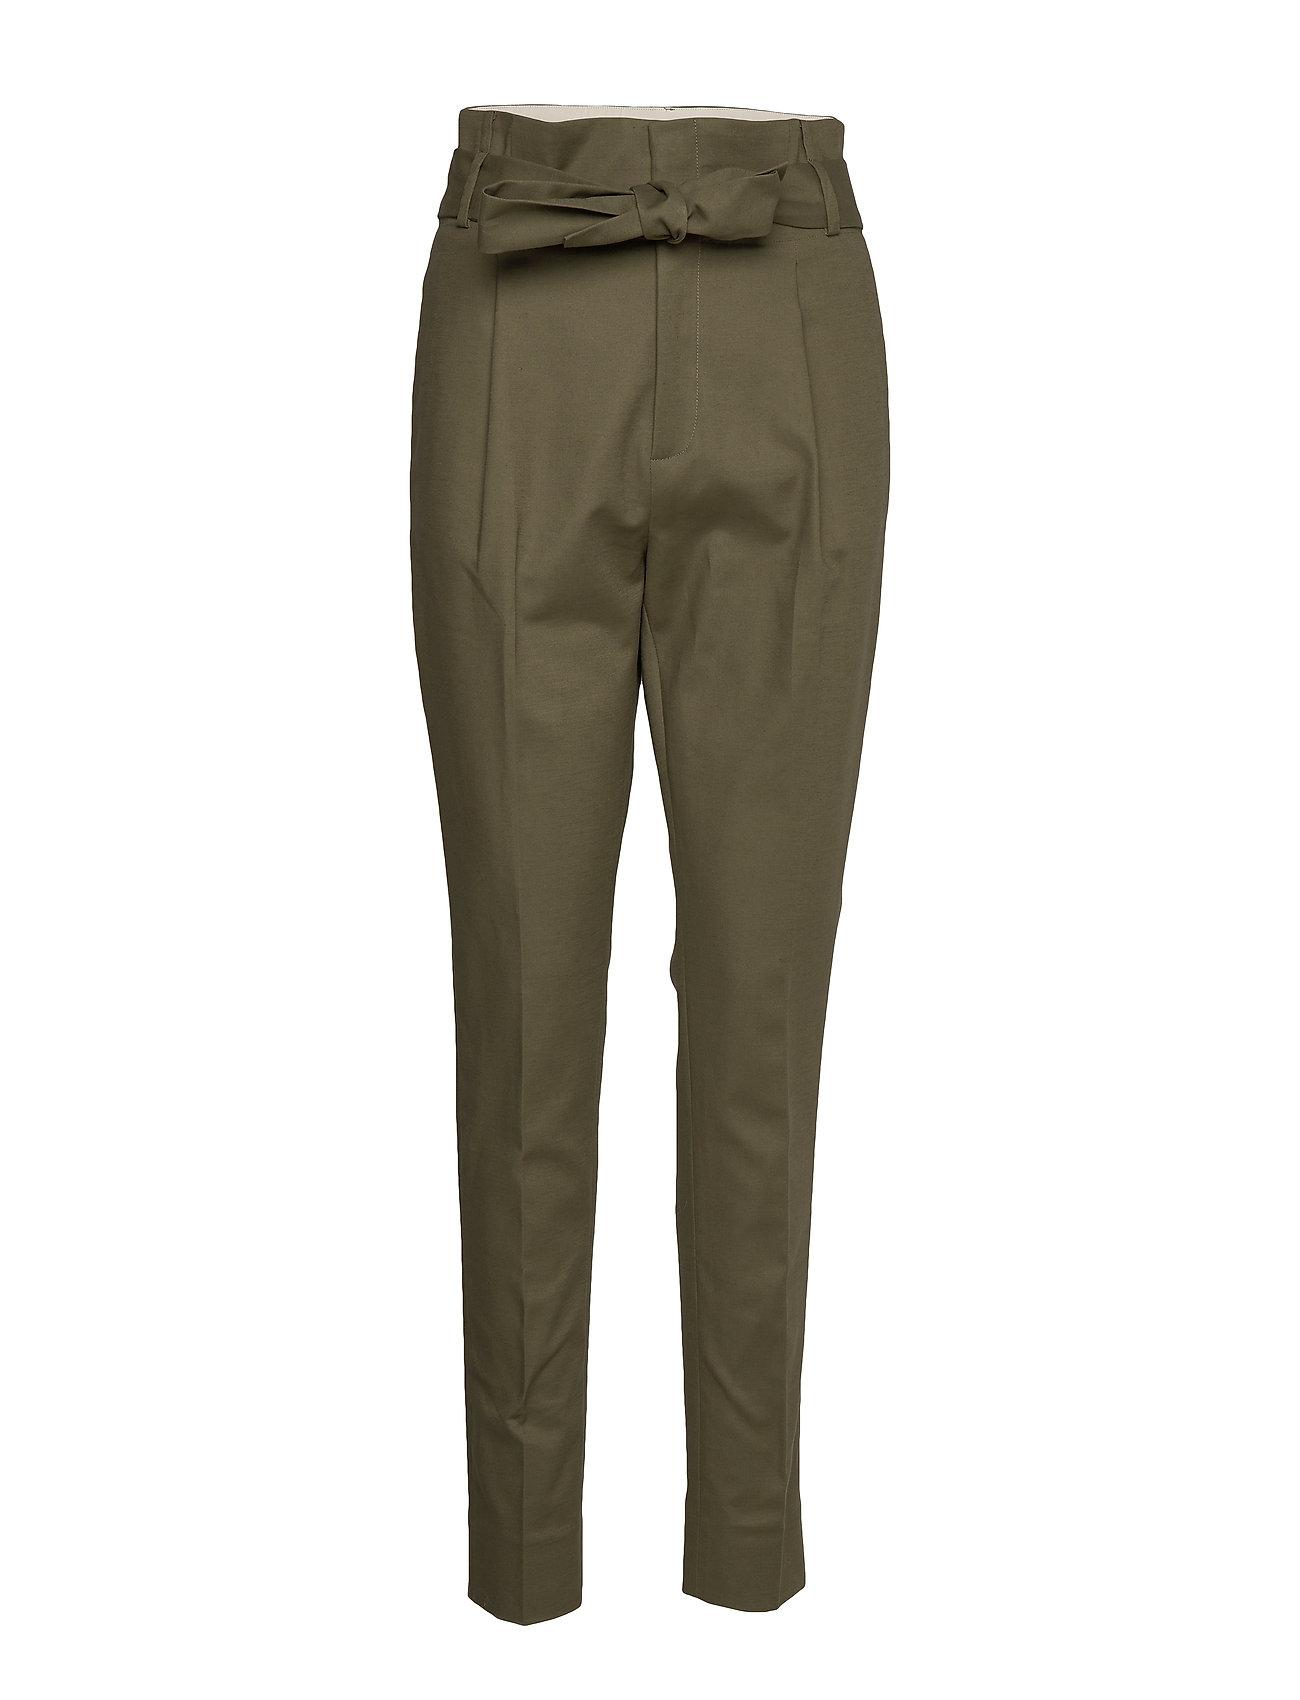 Noa Noa Trousers - WINTER MOSS